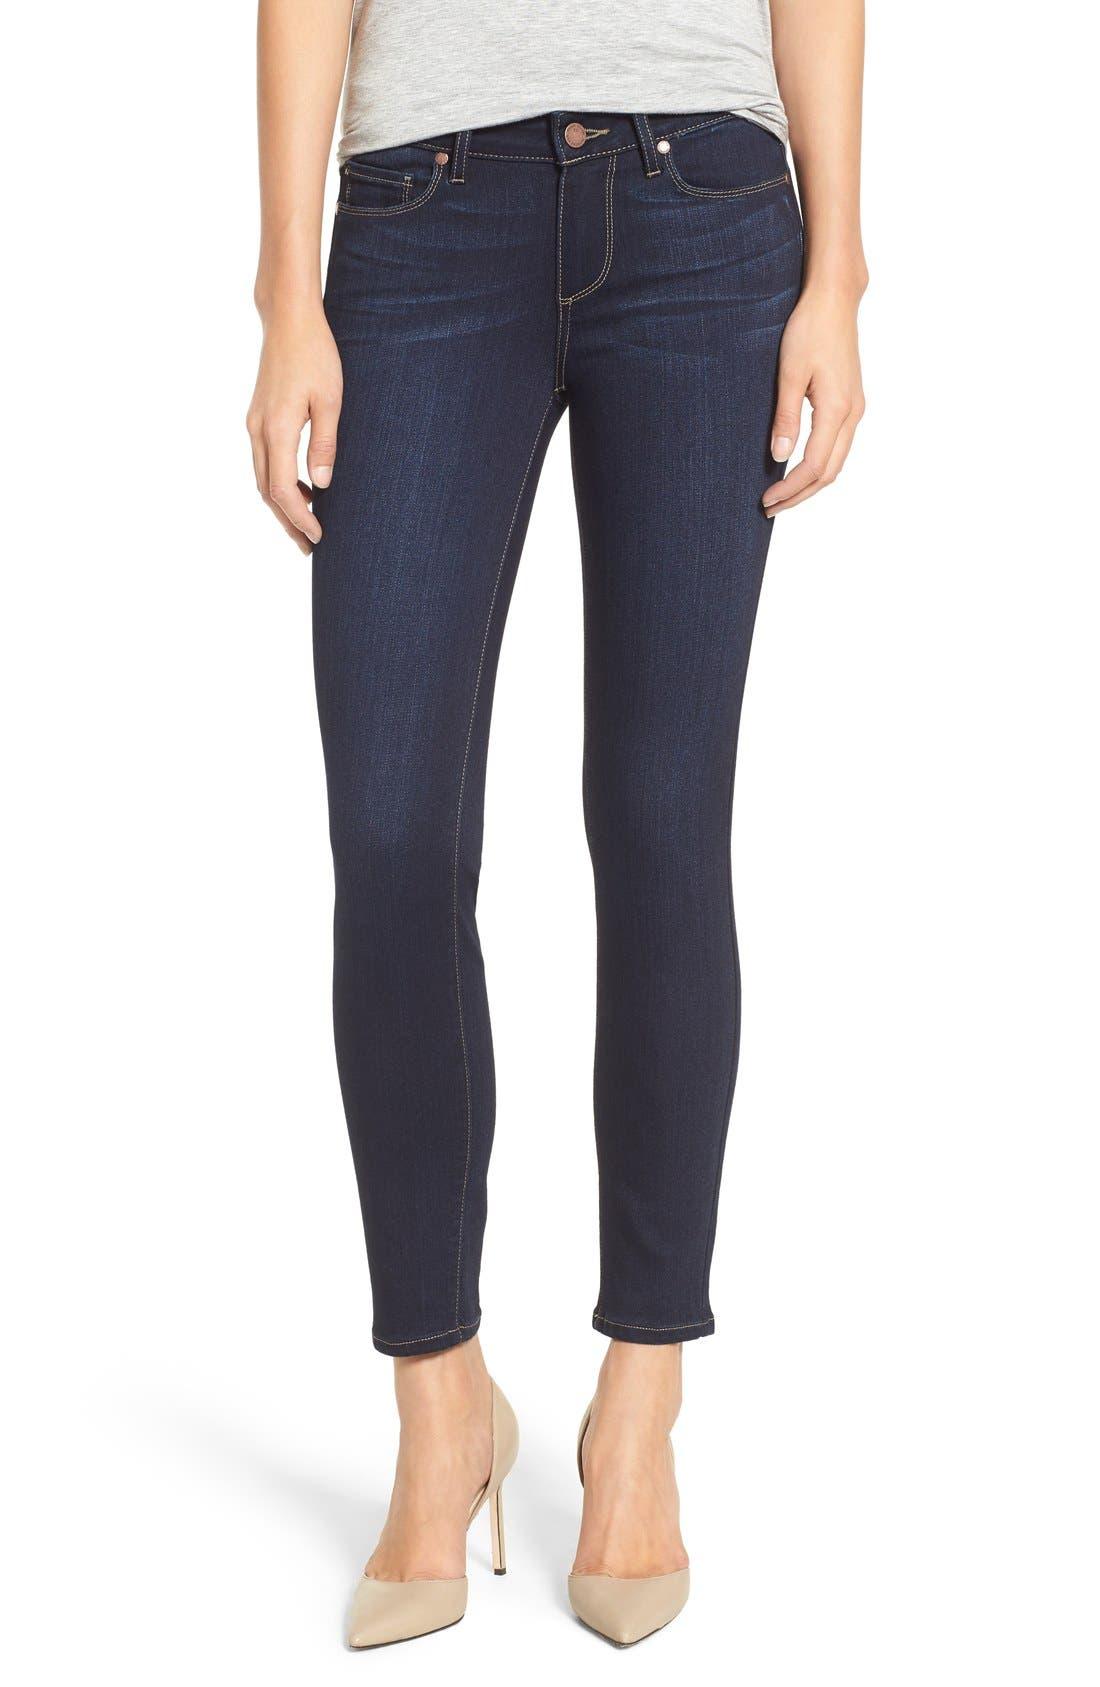 Main Image - PAIGE 'Transcend - Verdugo' Ankle Skinny Jeans (Tari)